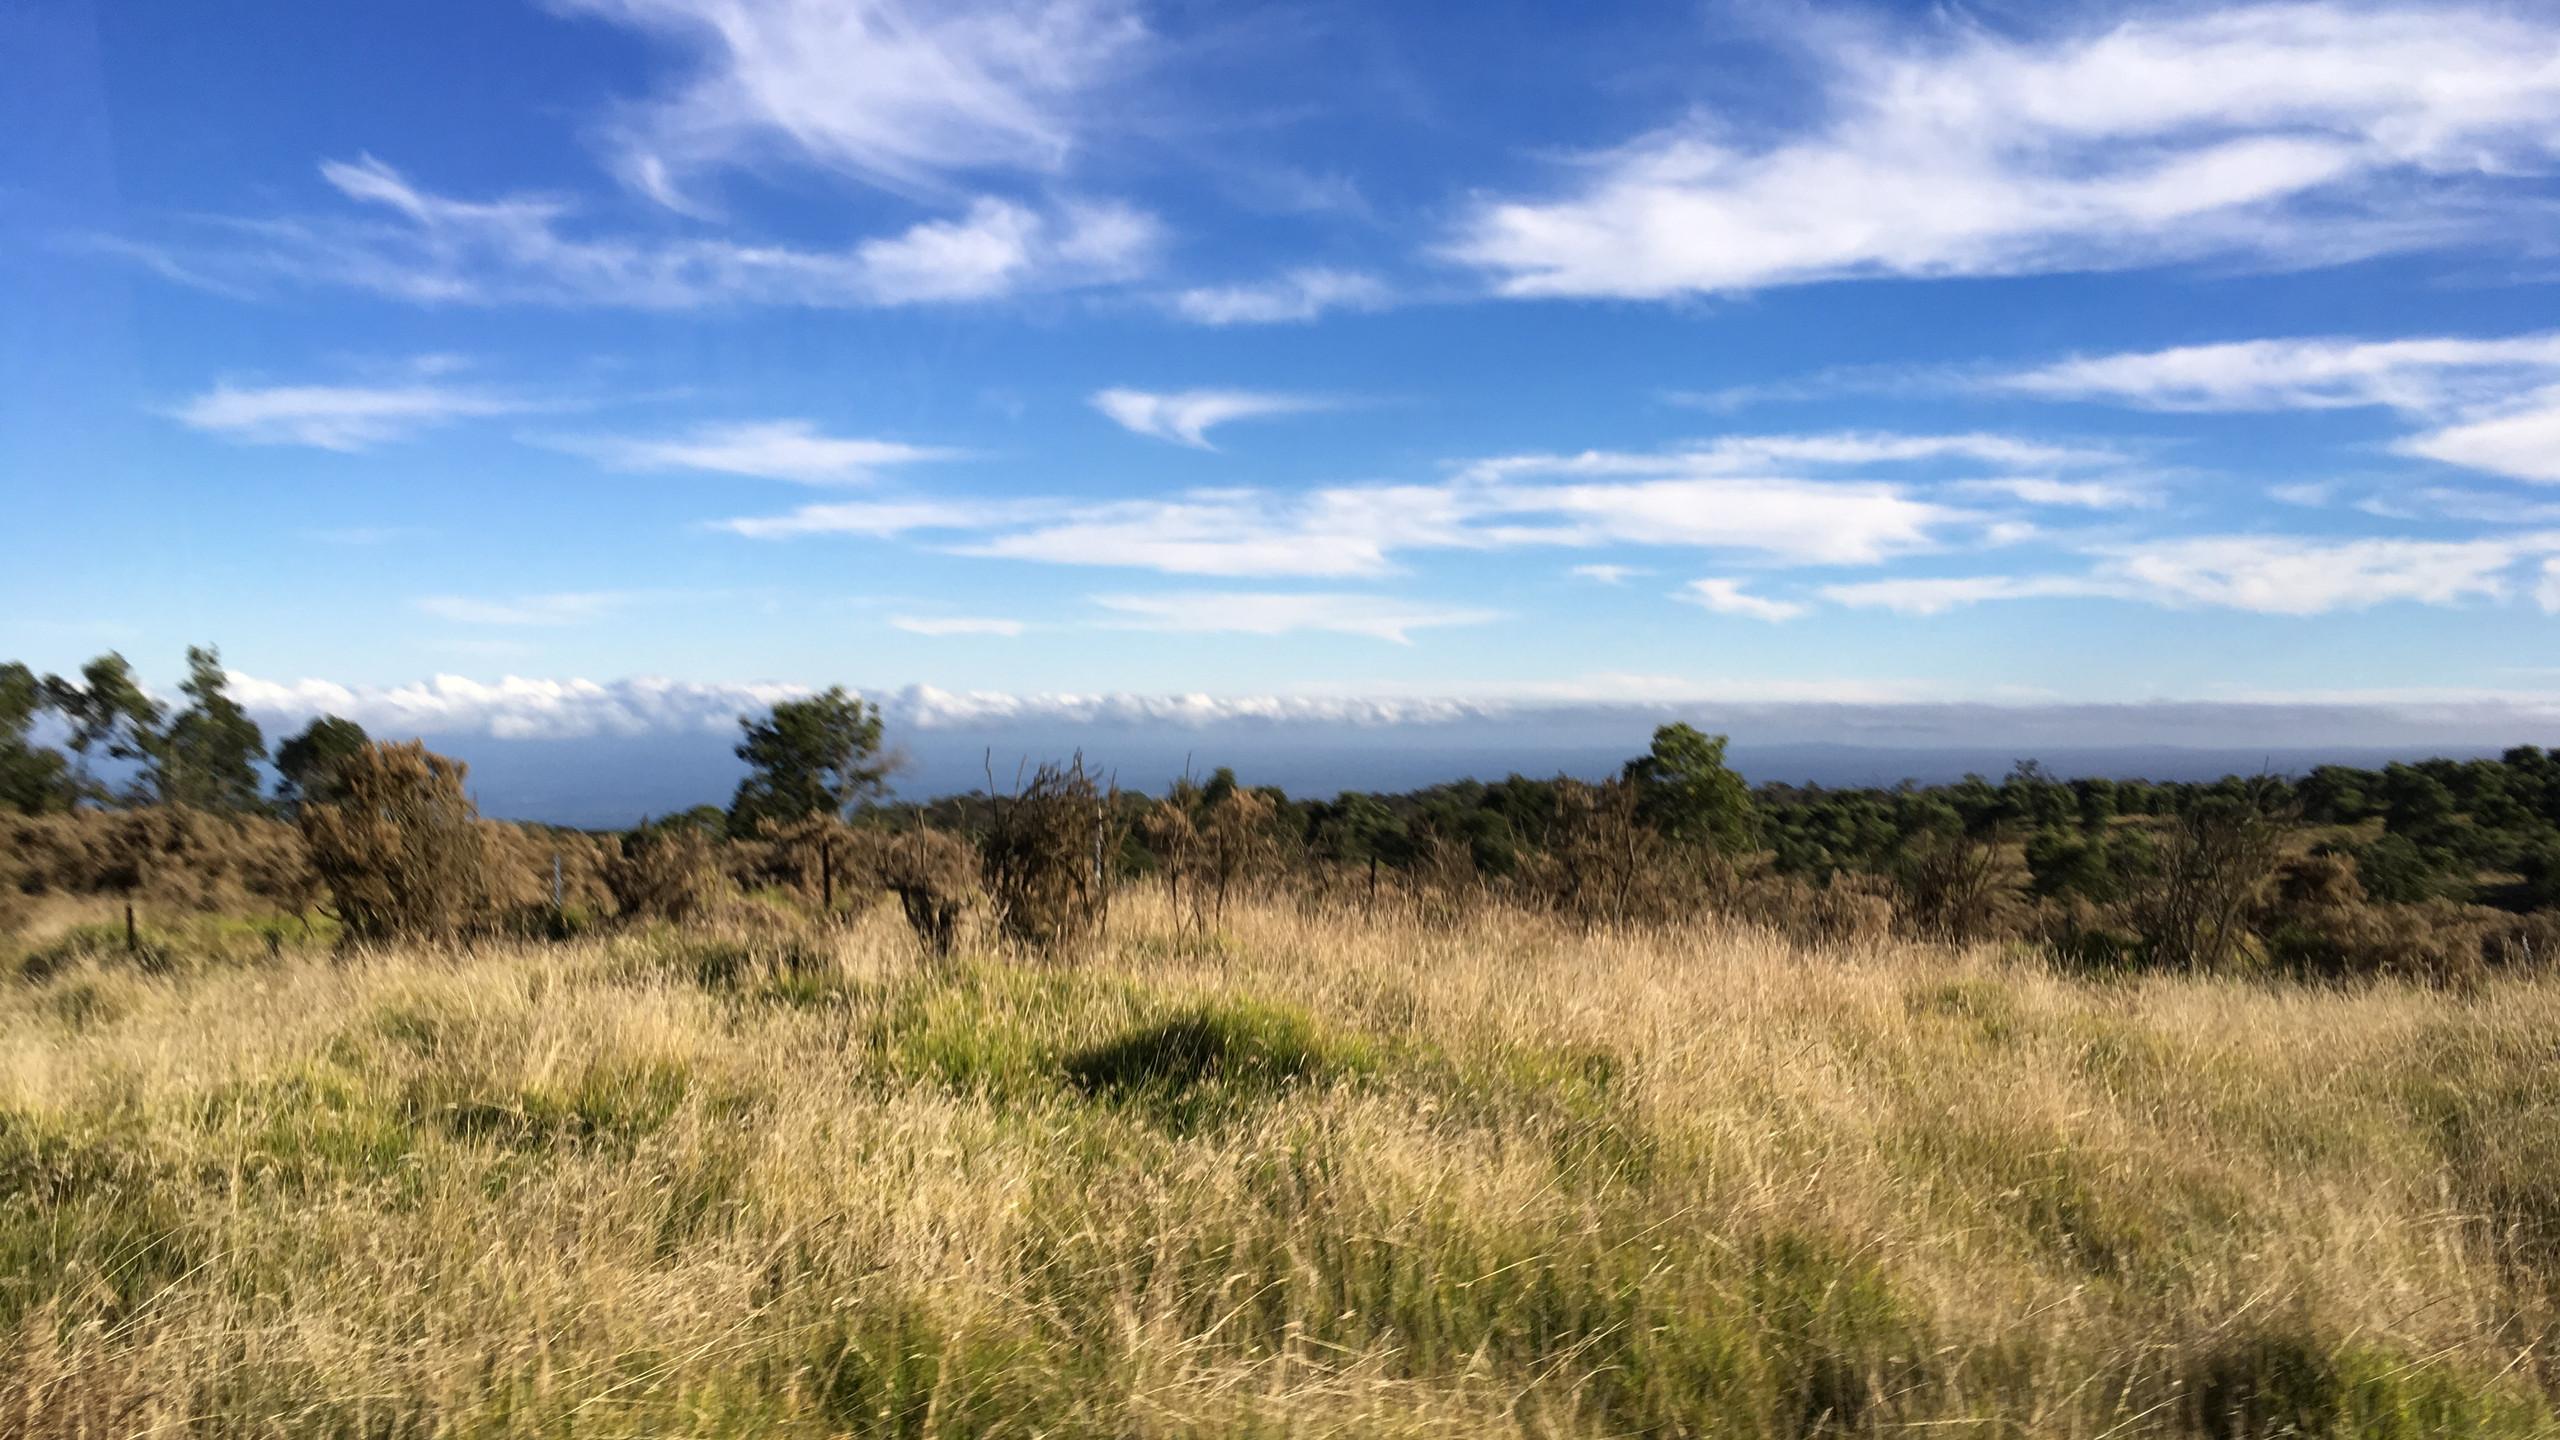 On Mauna Kea